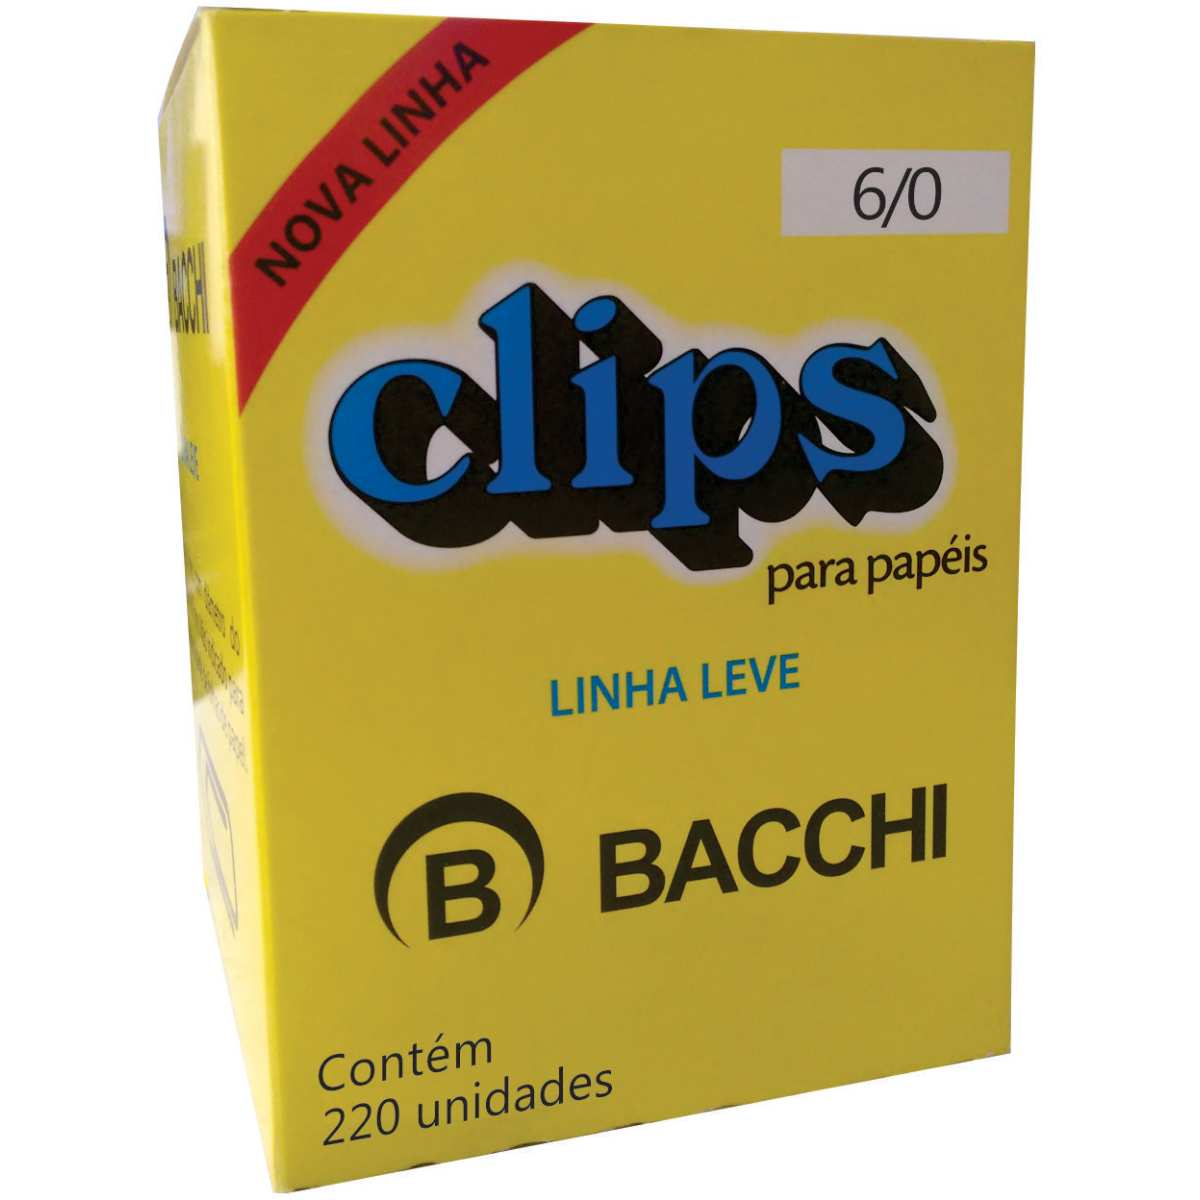 CLIPS METÁLICOS BACCHI Nº 6/0 220UN